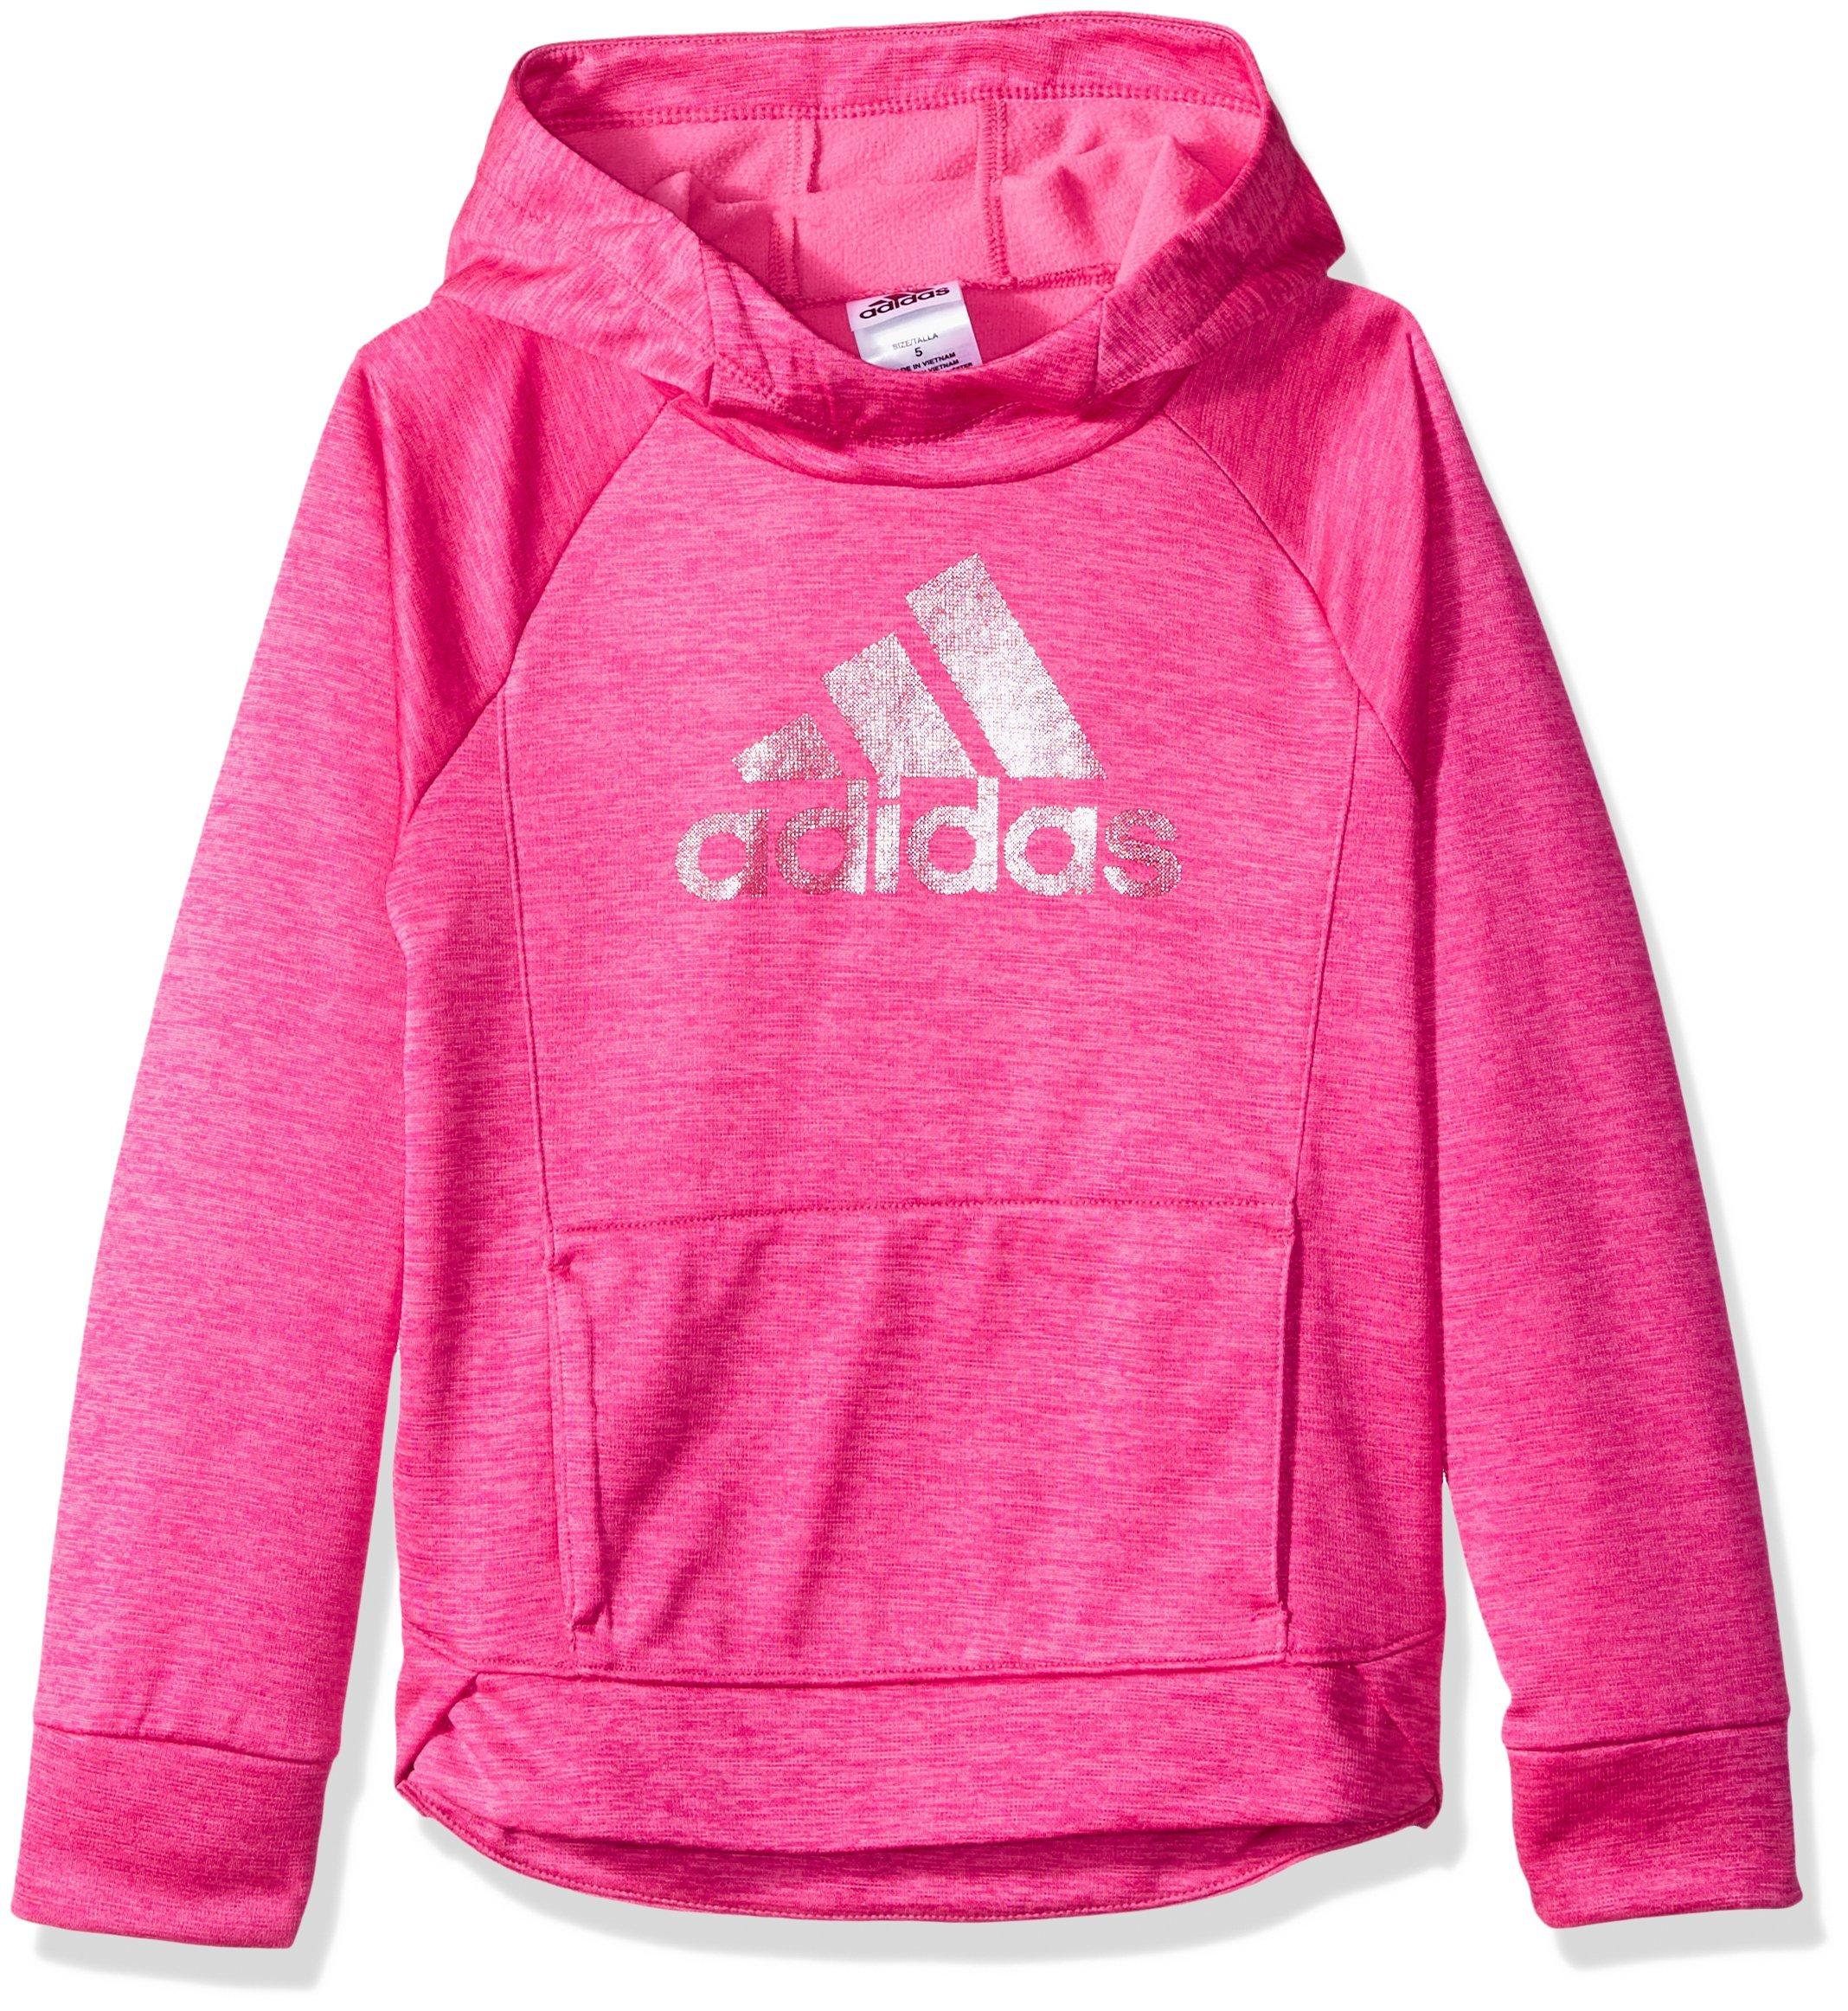 adidas Girls' Big Pullover Sweatshirt, Real Magenta Heather, M (10/12)